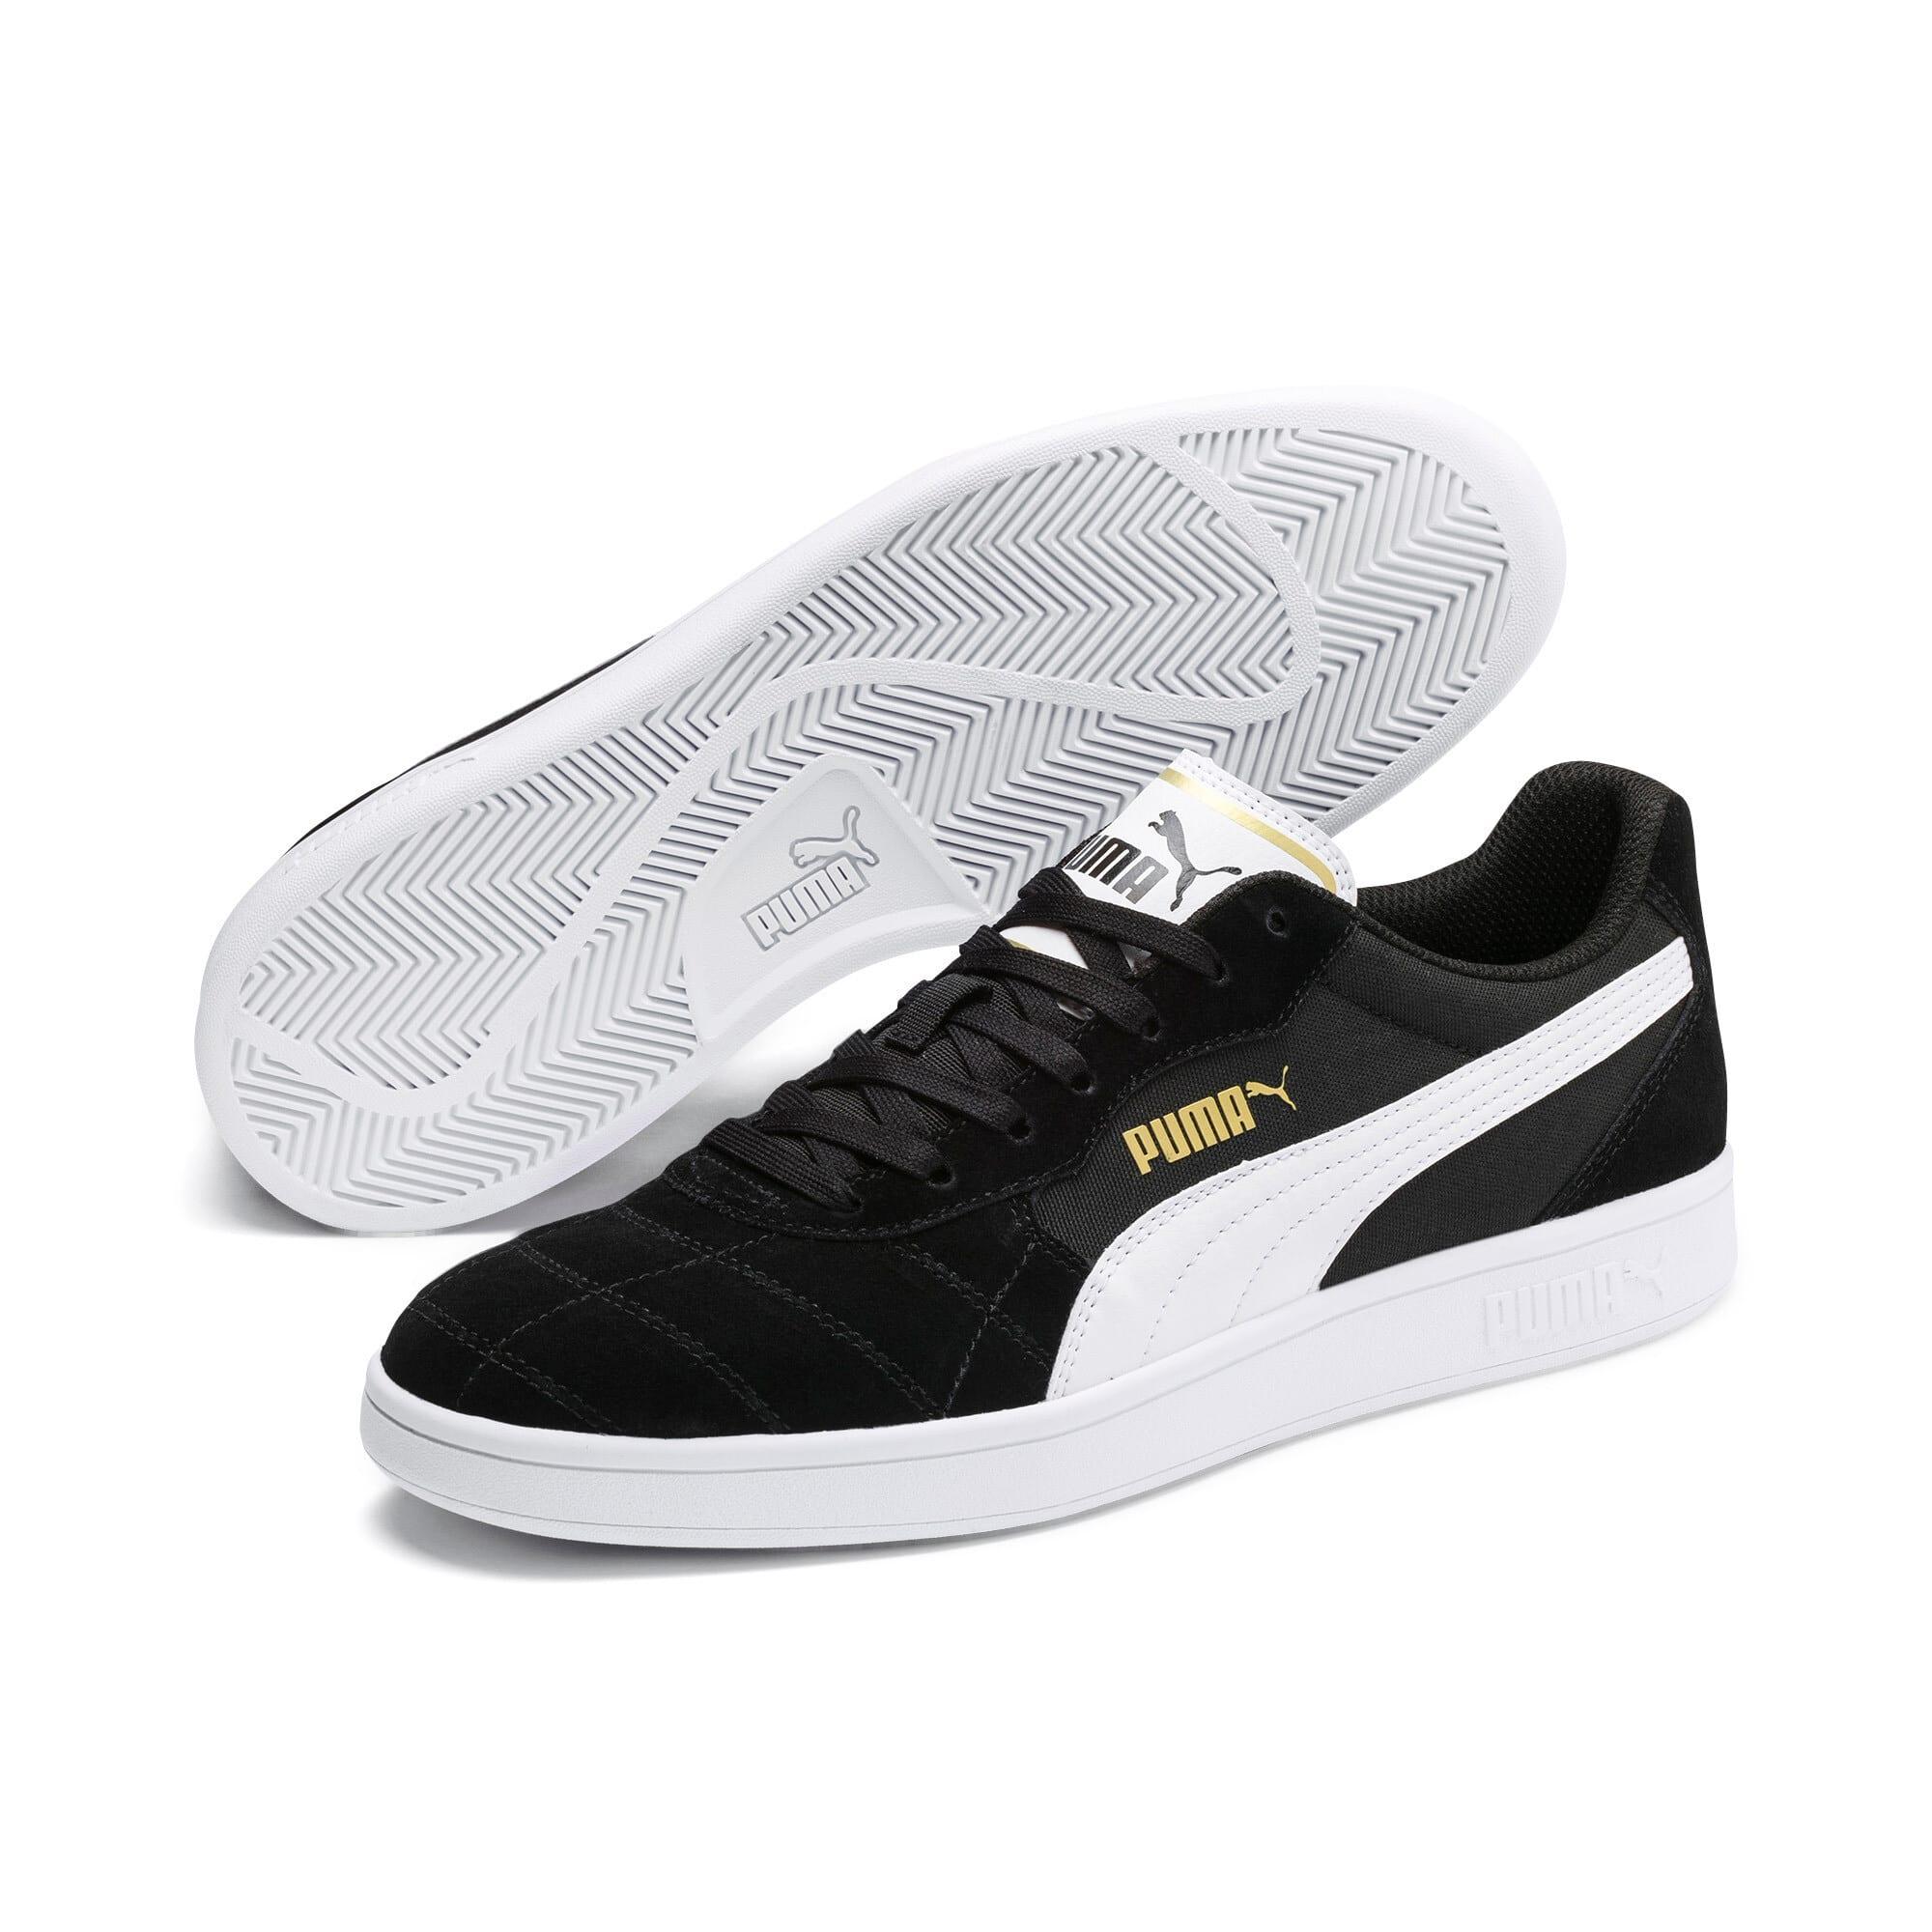 Thumbnail 3 of Astro Kick Sneakers, Puma Black-Puma White, medium